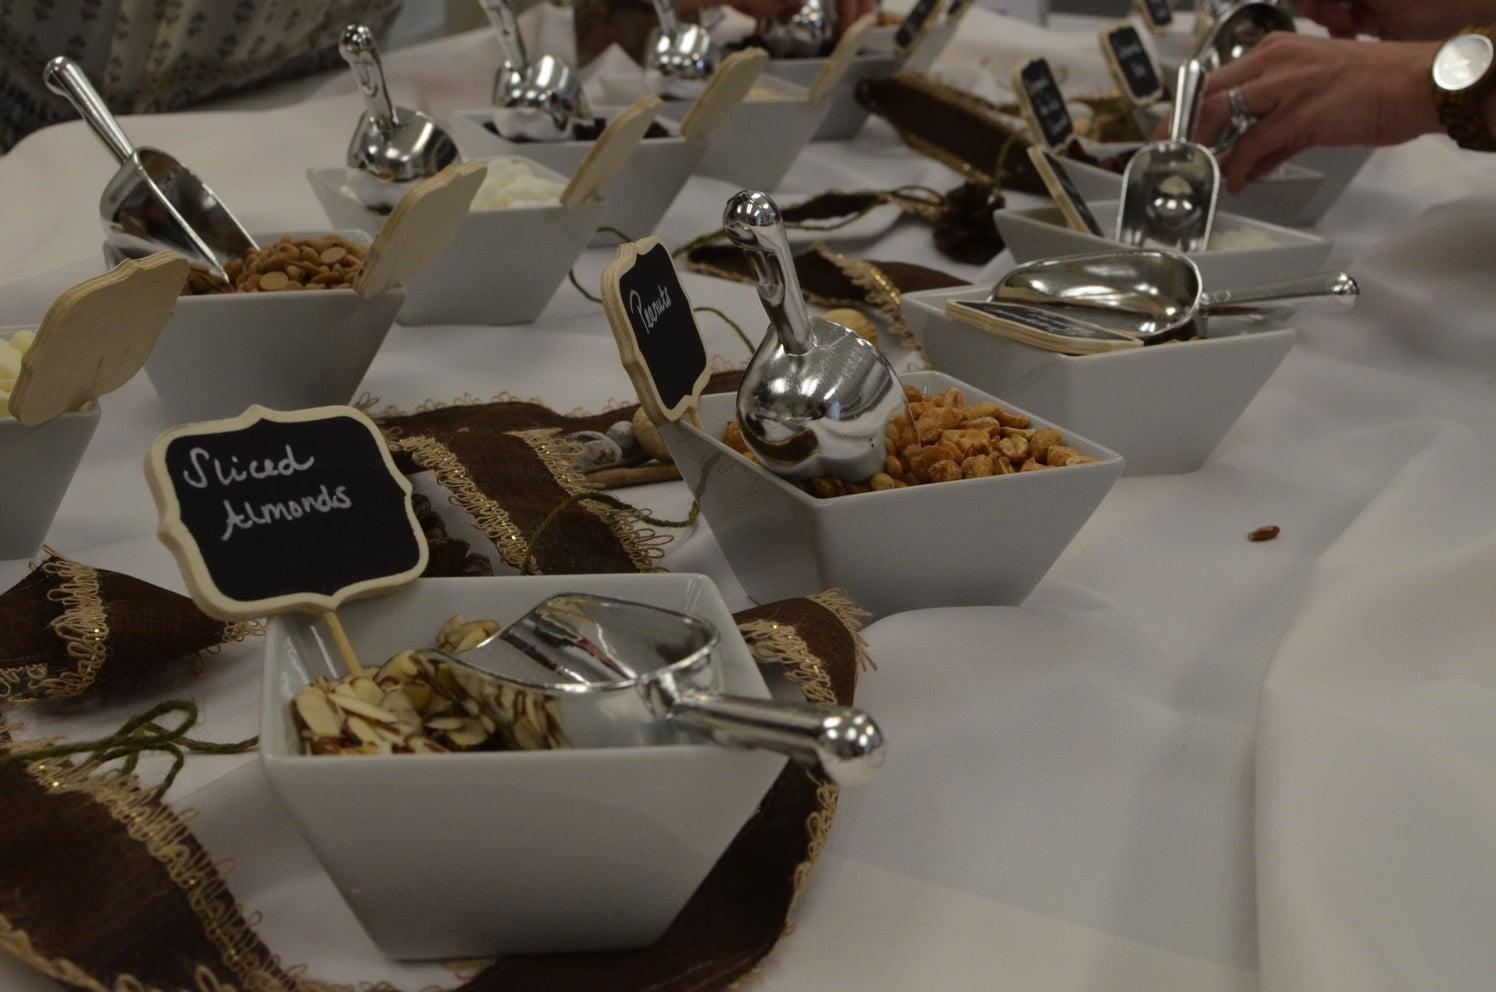 DIY Cookie Bar in a Jar Gift Idea from ALDI